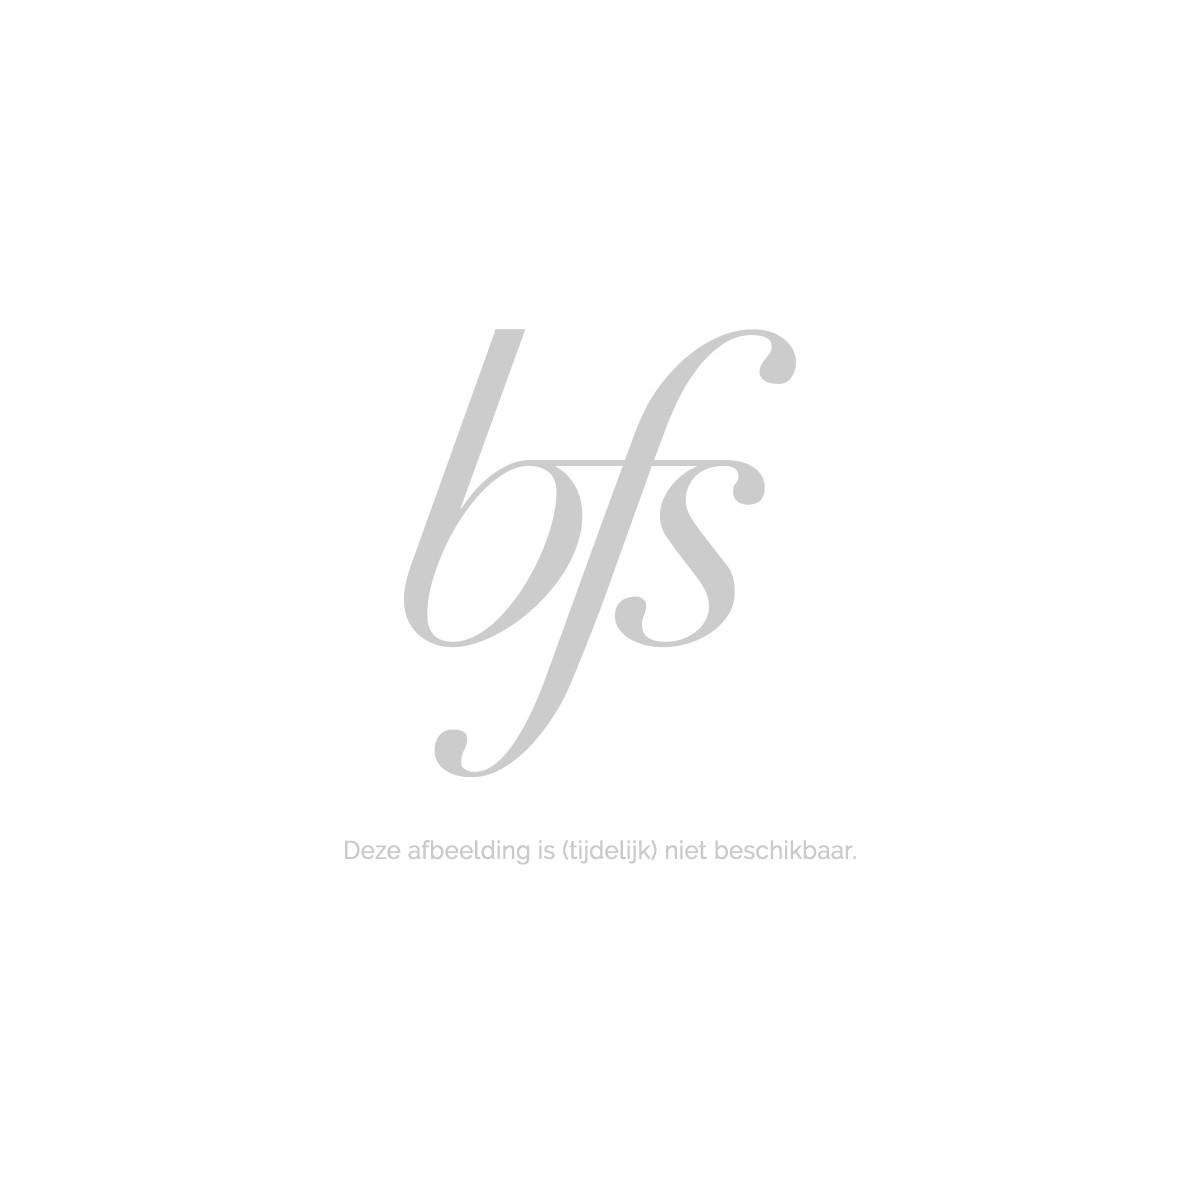 Pupa IM Matt Lip Fluid 072 Fancy Fuchsia